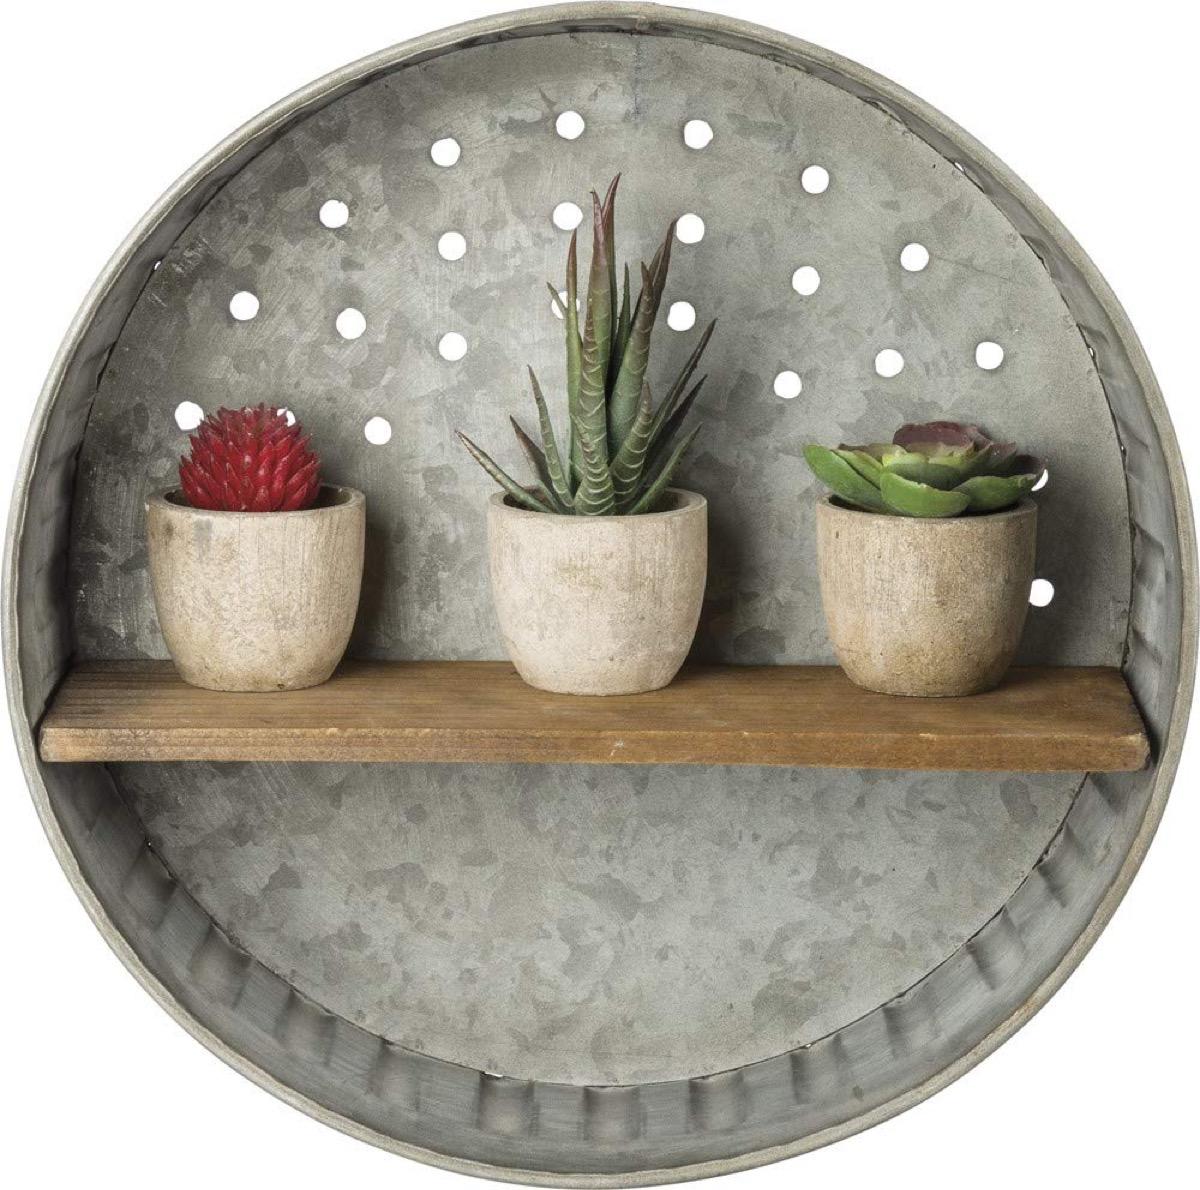 round metal shelf with succulents, rustic farmhouse decor